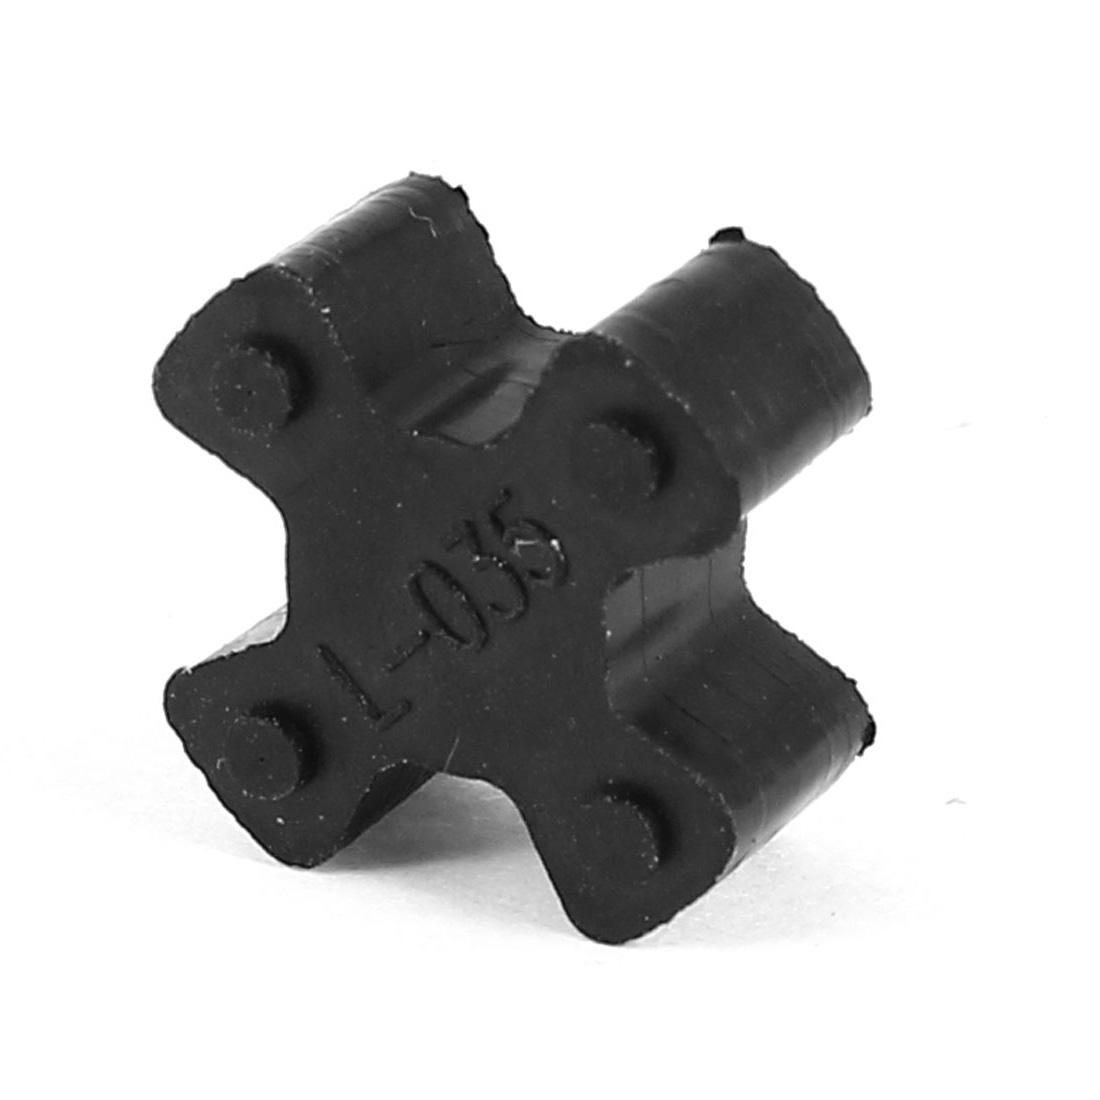 Black 15mm Diameter 4 Petals PU Coupling Shaft Center Spider Coupler Damper